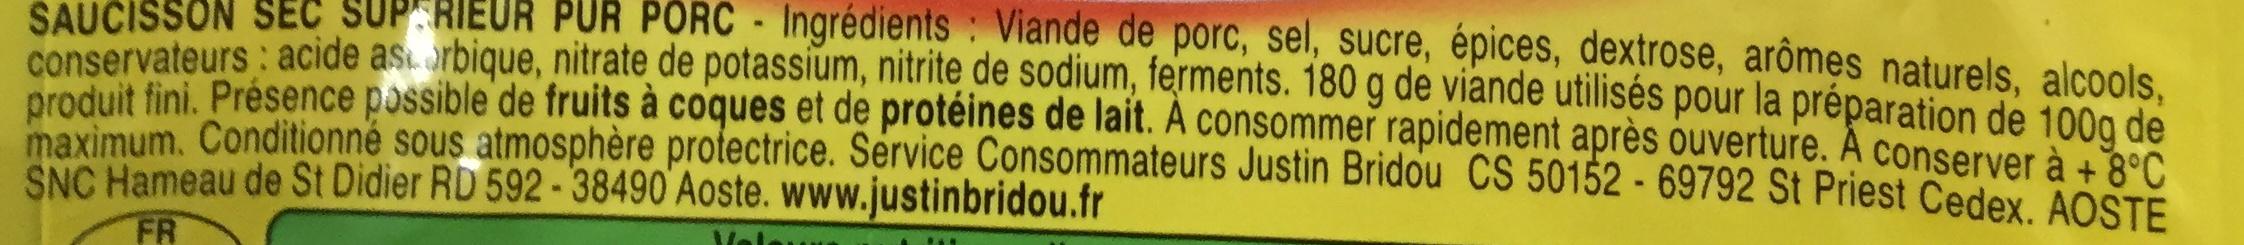 Rondelles de Bâton de berger - Inhaltsstoffe - fr